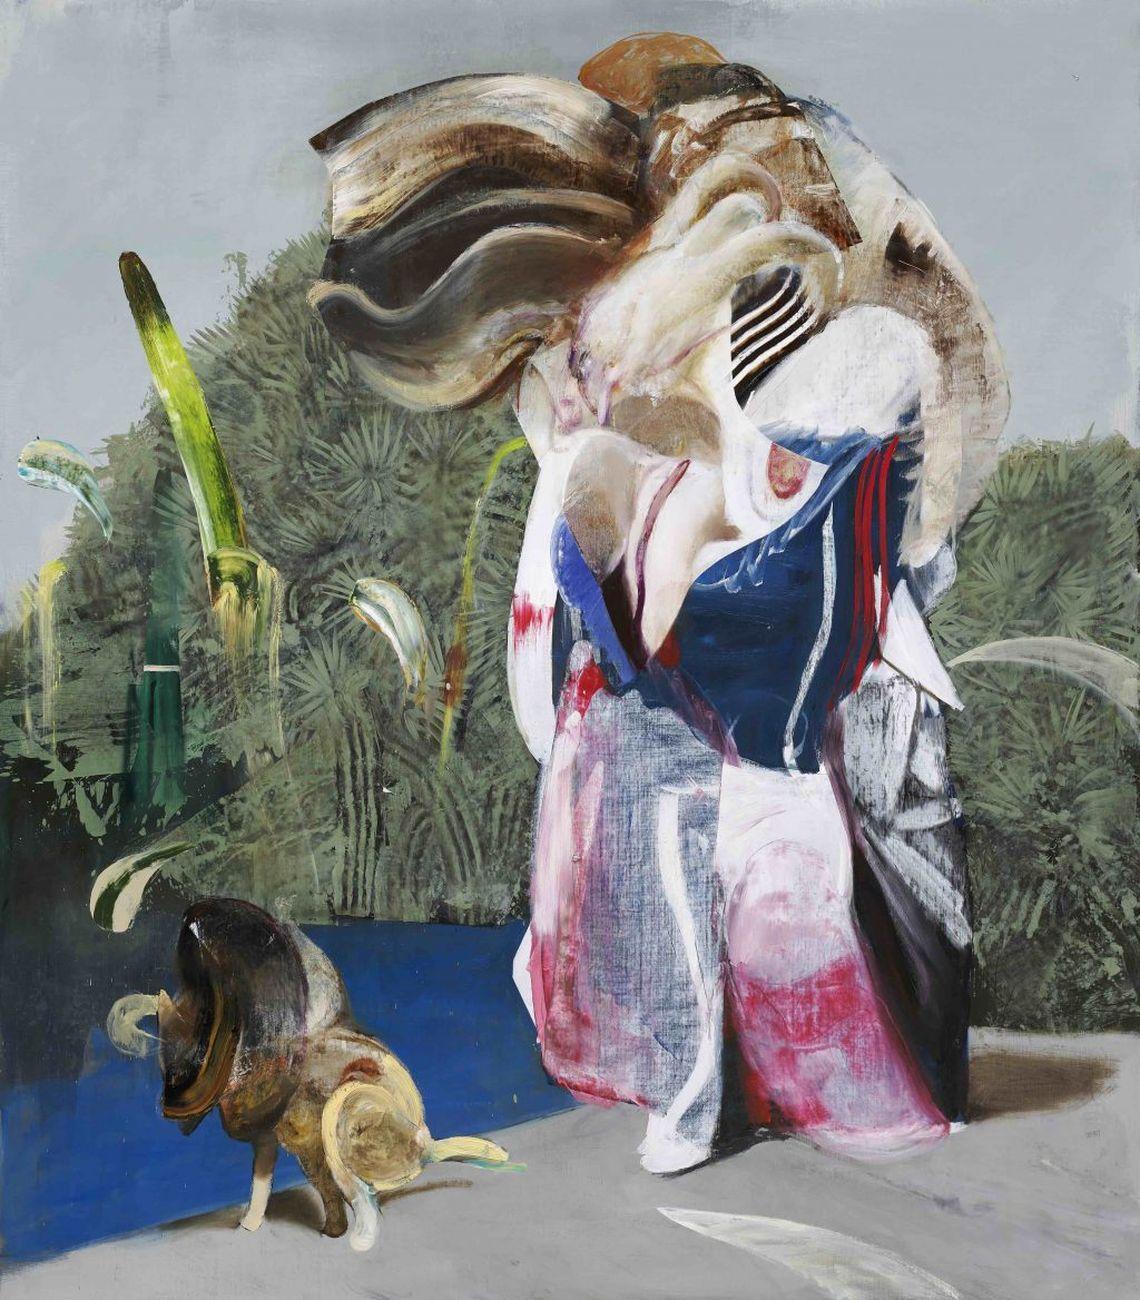 Adrian Ghenie, Figure with Dog, 2019. Courtesy Galerie Thaddaeus Ropac, London Paris Salzburg © Adrian Ghenie